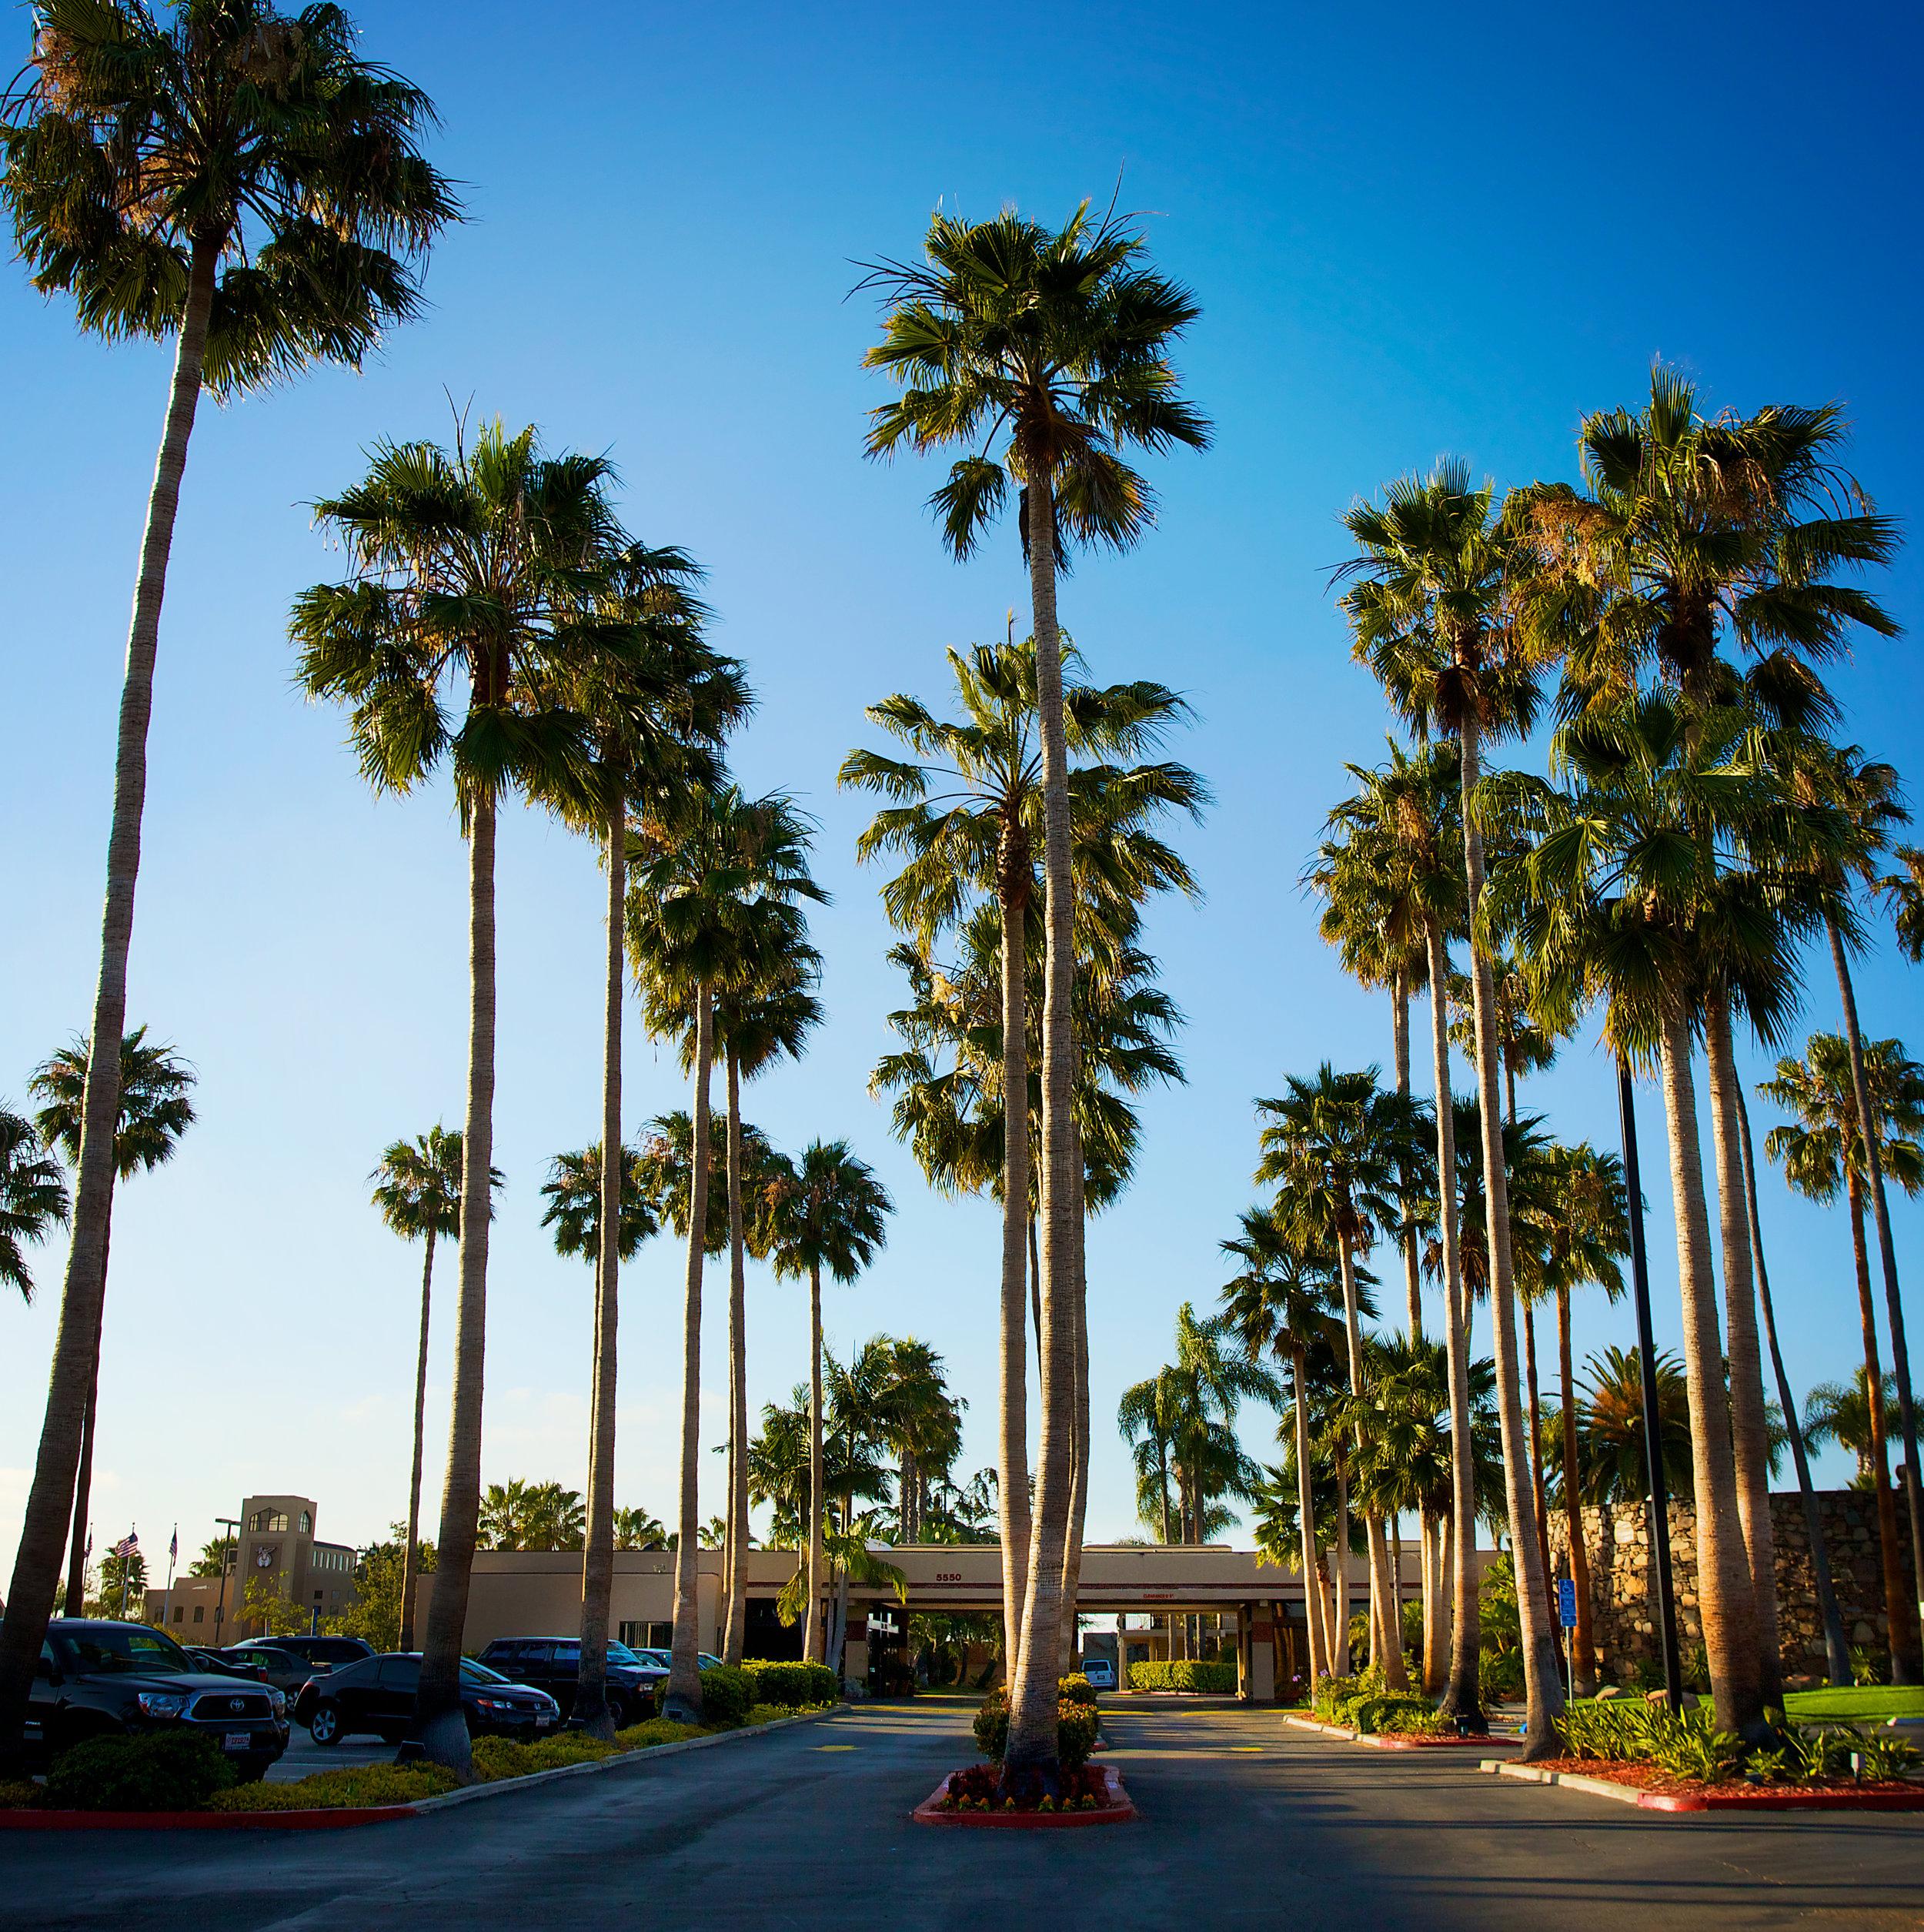 longview of palm trees